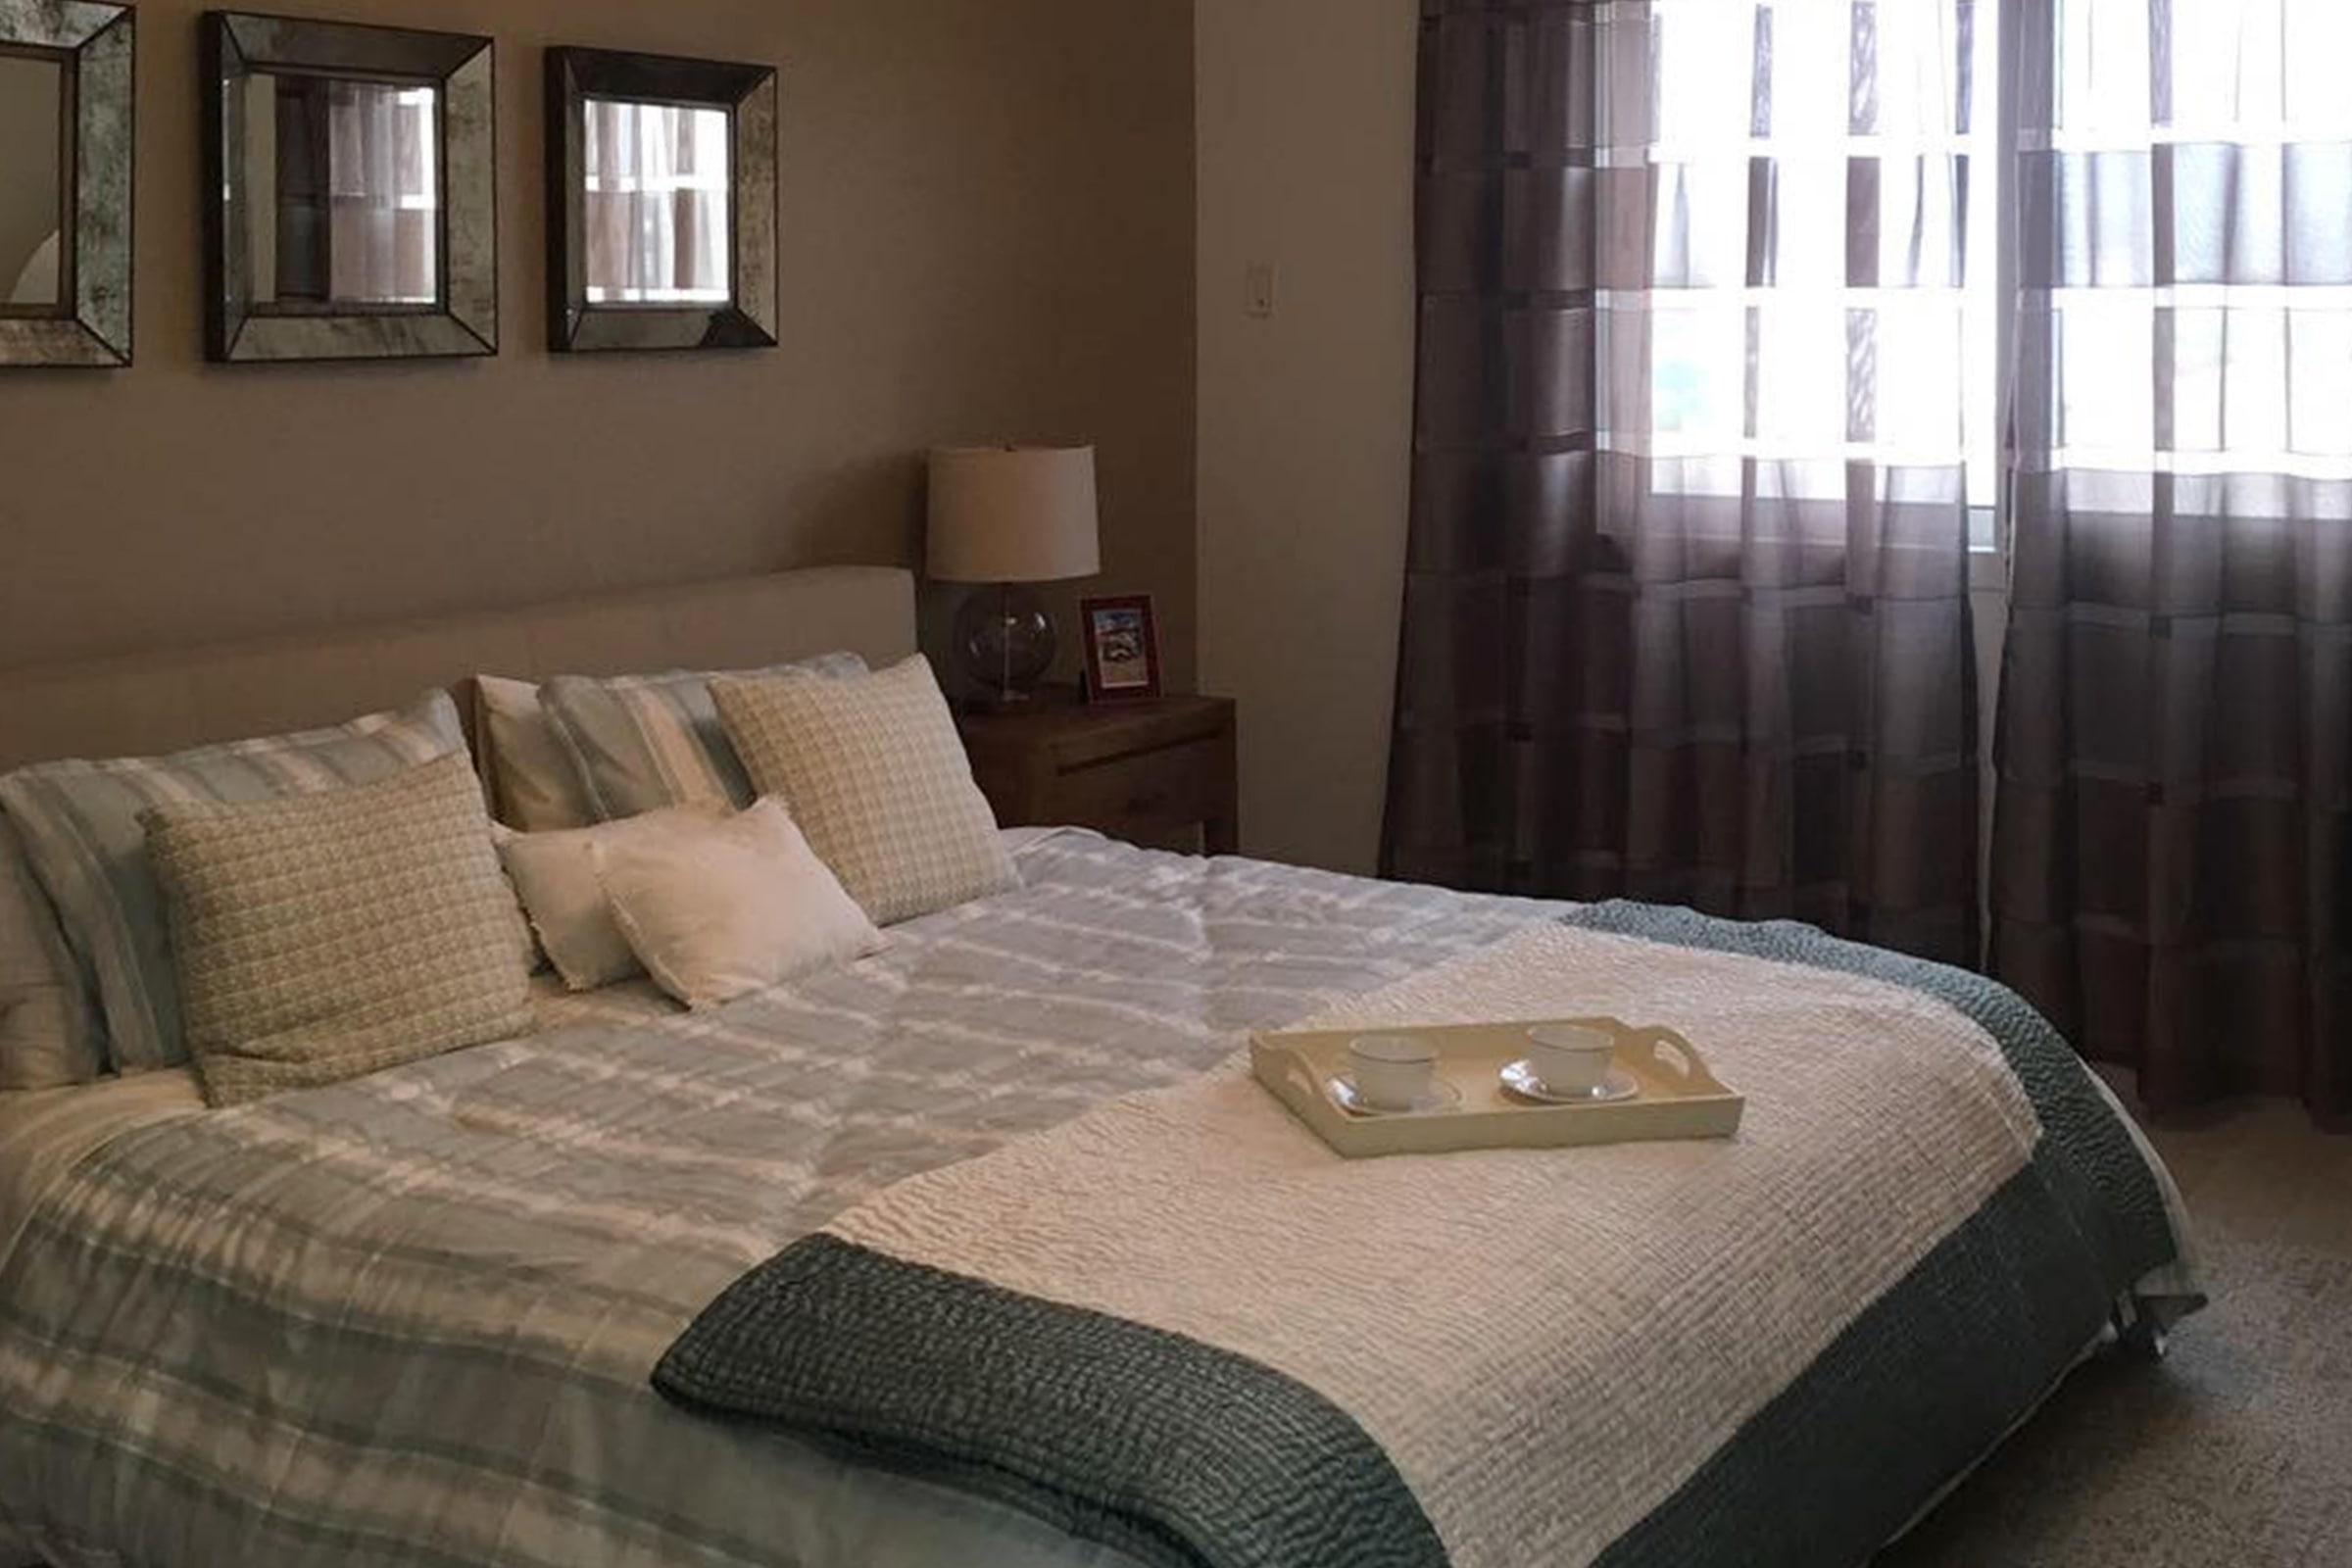 Unique two bedroom|lowest price per sqft